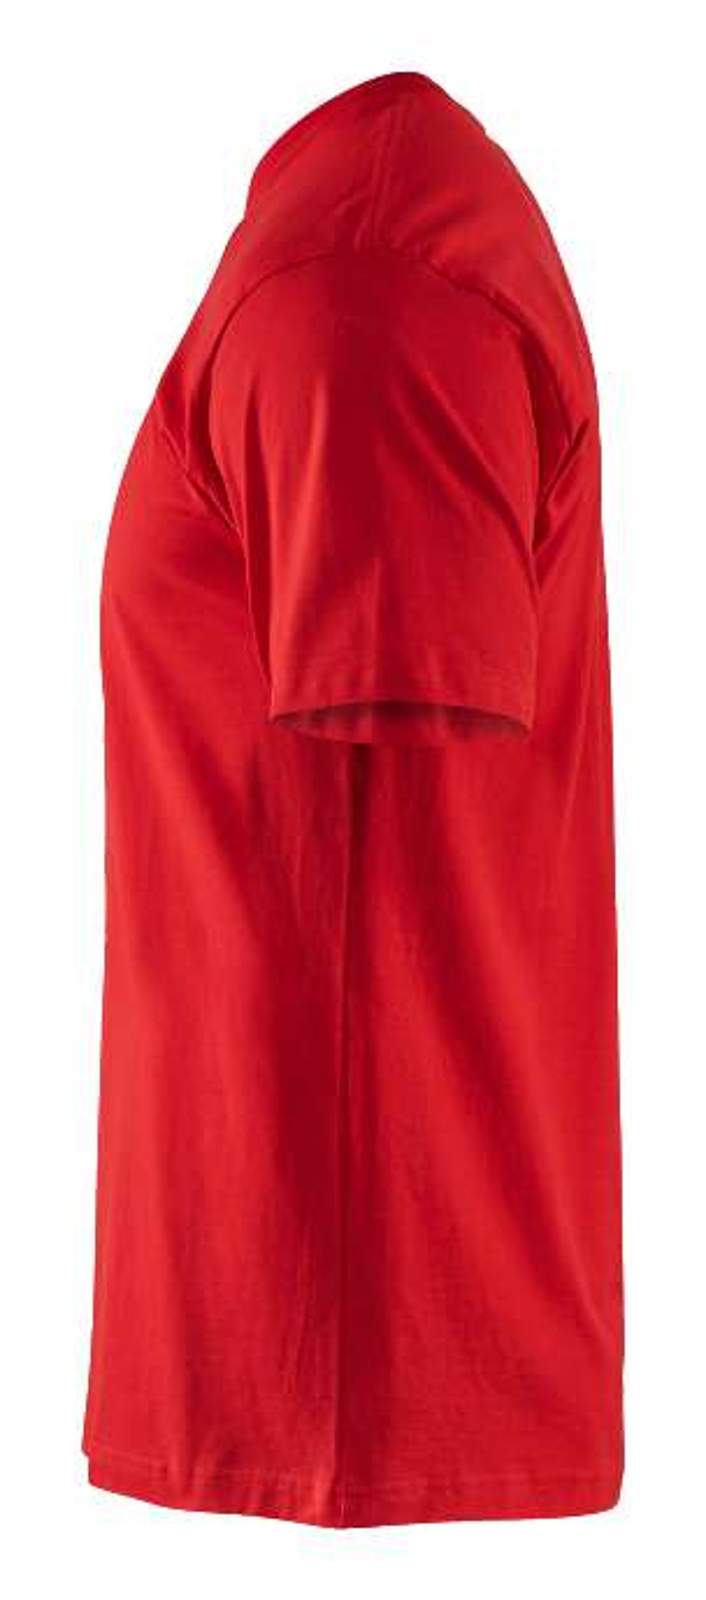 Blaklader T-shirts 33021030 10-pack rood(5600)